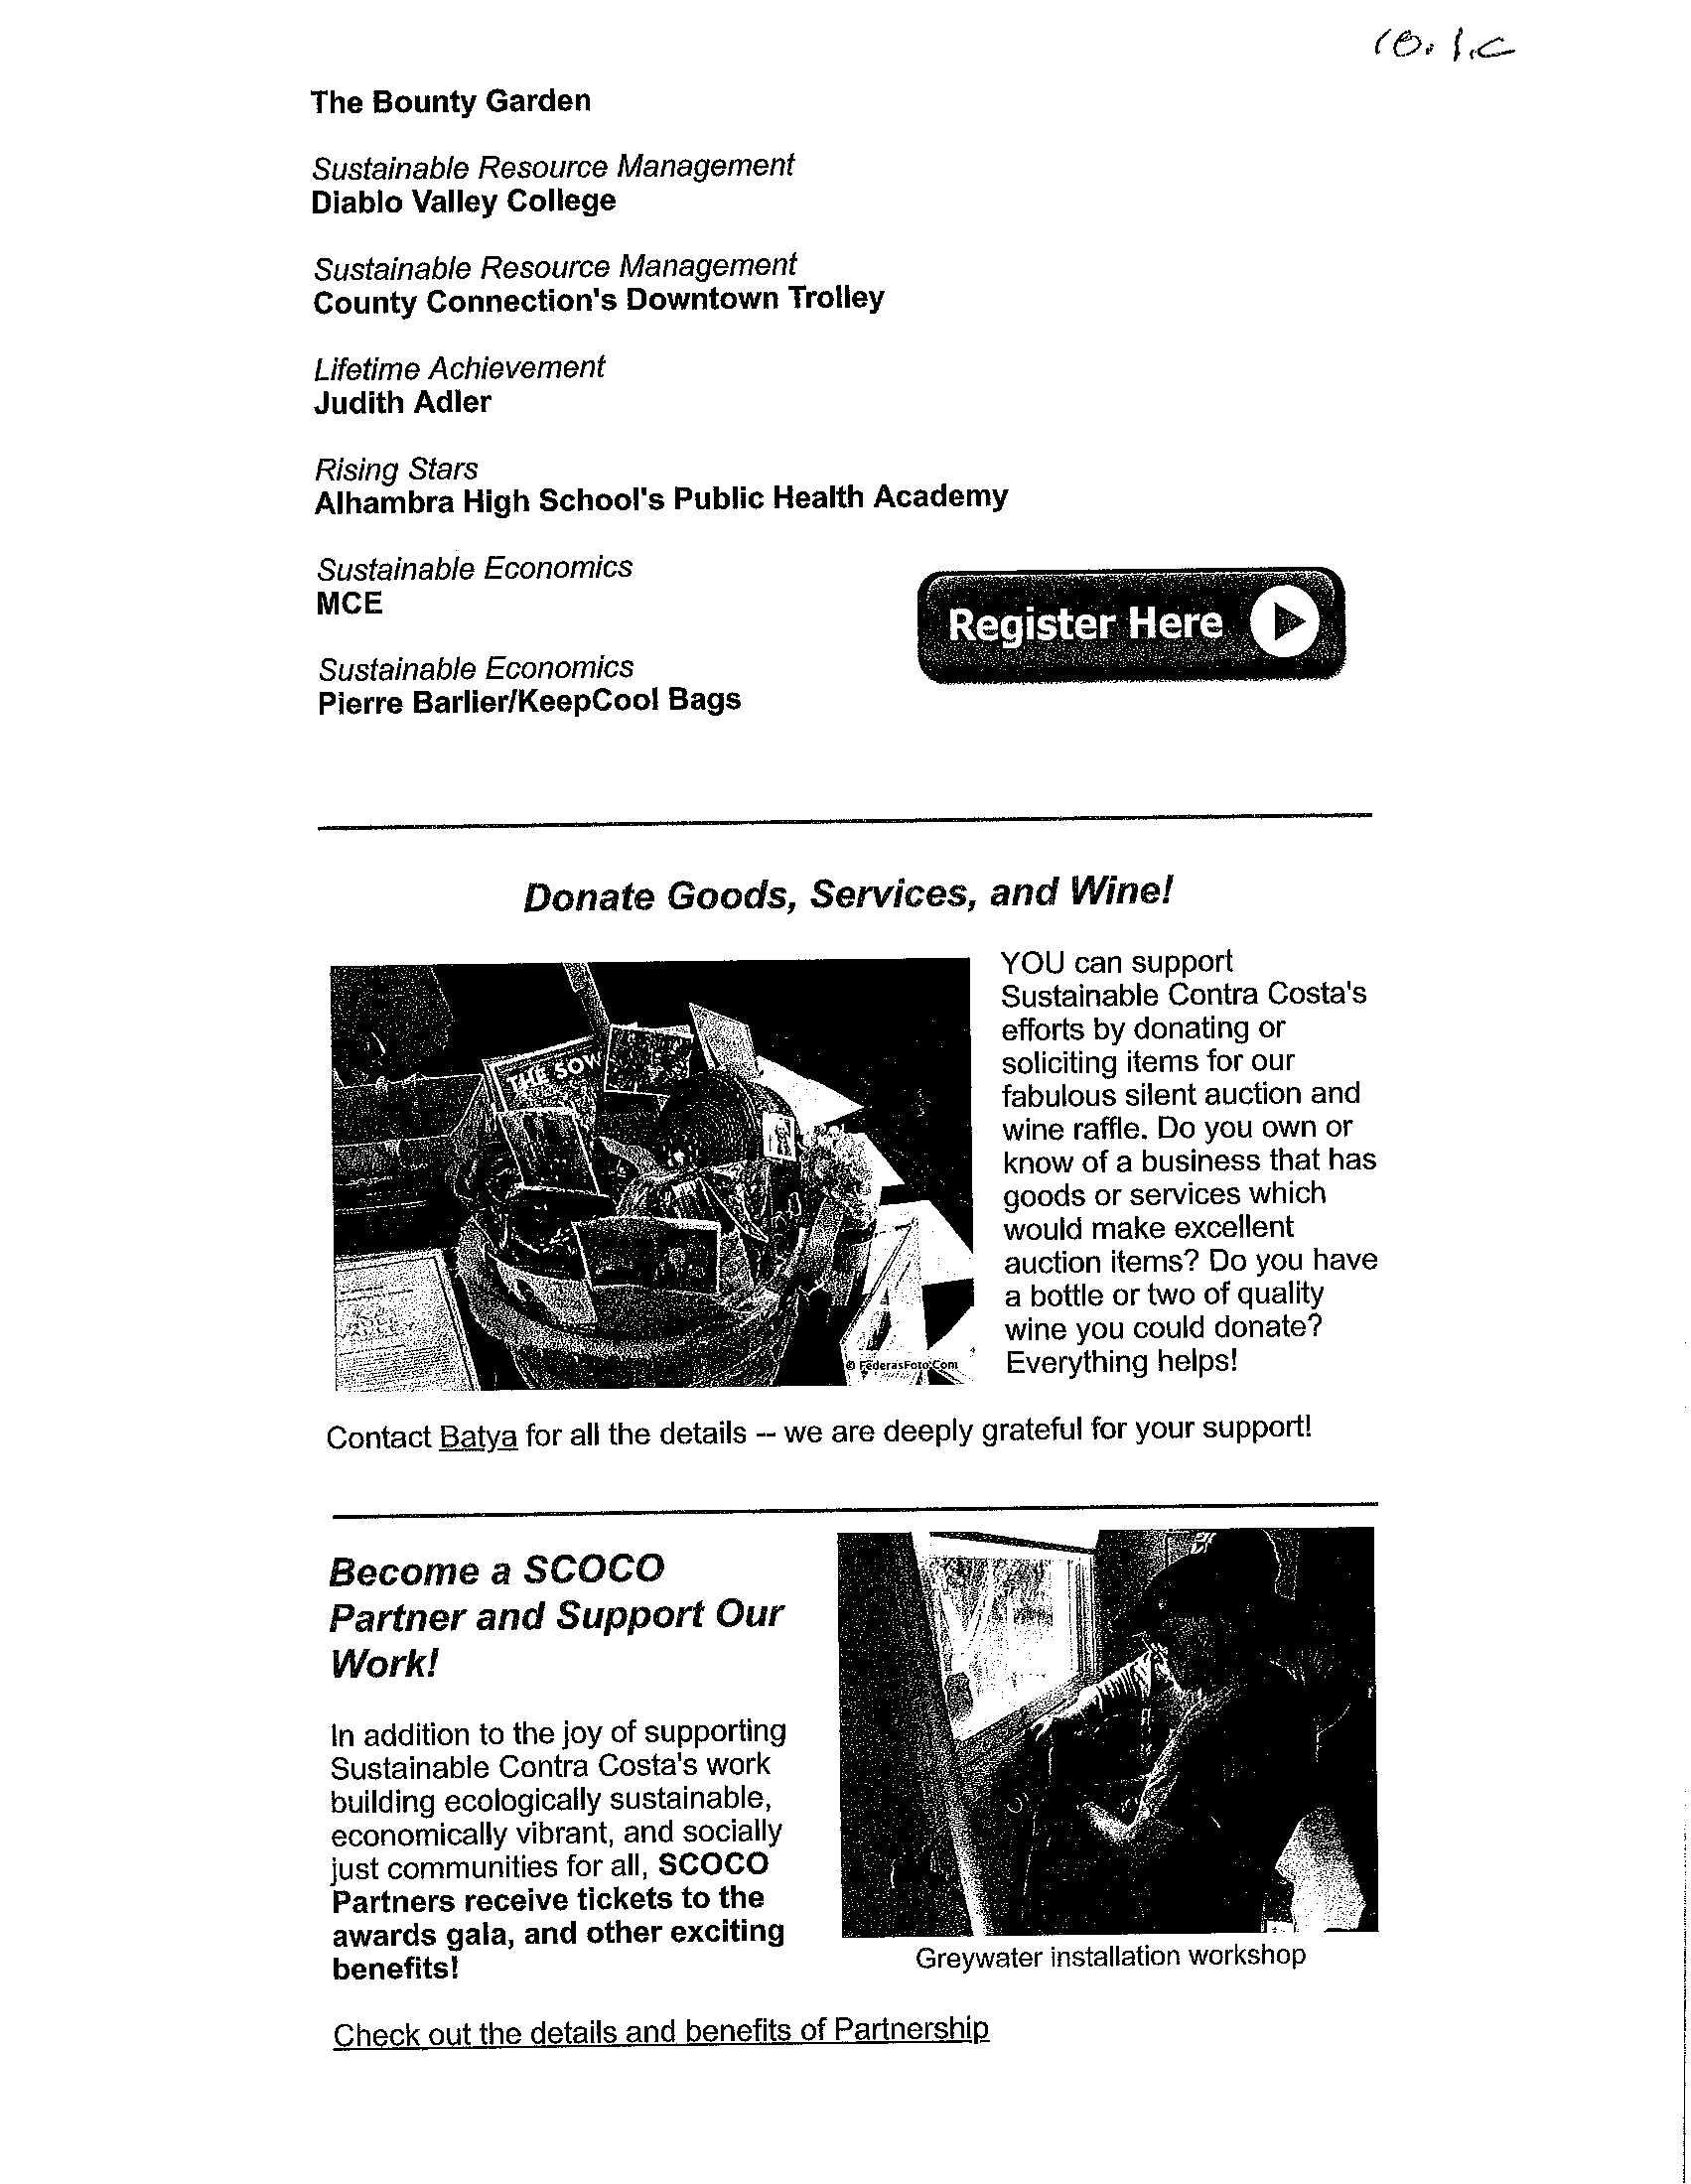 ESMAC Agenda 10.10.2018 (32 Pages)_15.jpg